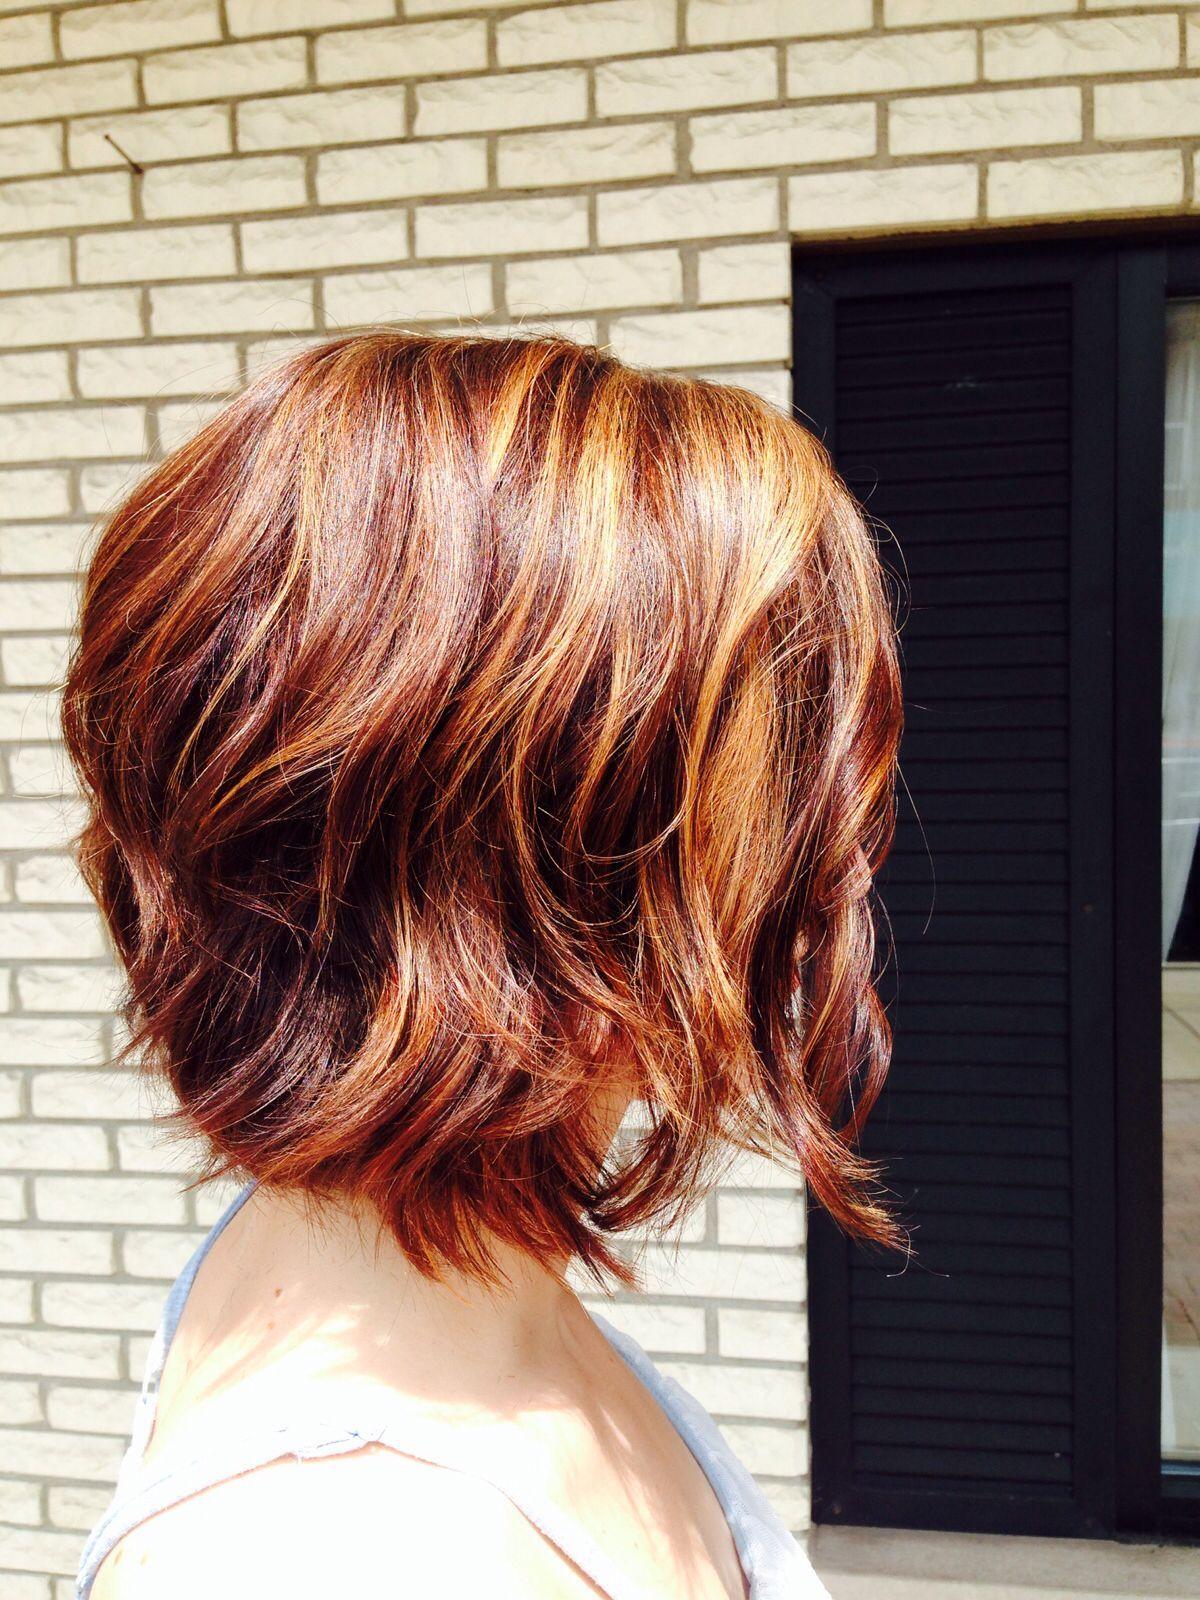 20 Best Short Wavy Haircuts For Women Popular Haircuts Short Wavy Haircuts Hair Styles Short Thin Hair